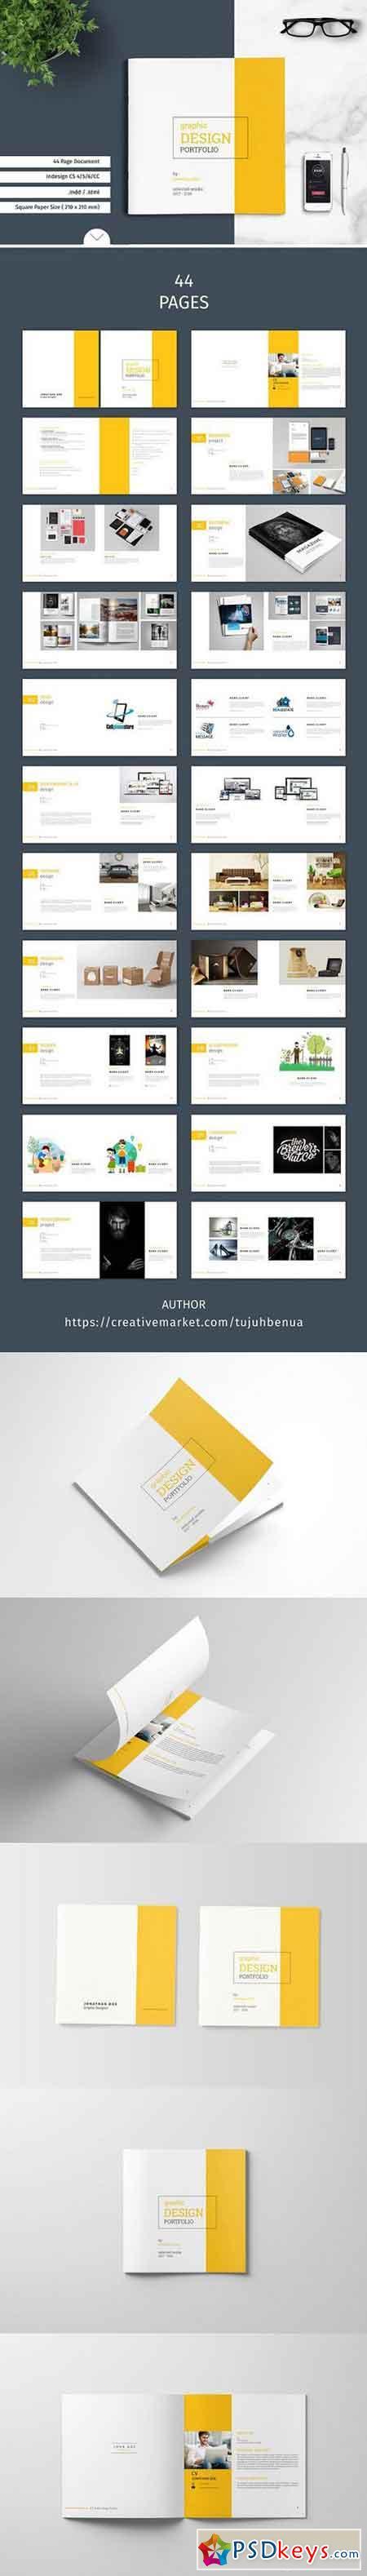 graphic design portfolio template 1398714  u00bb free download